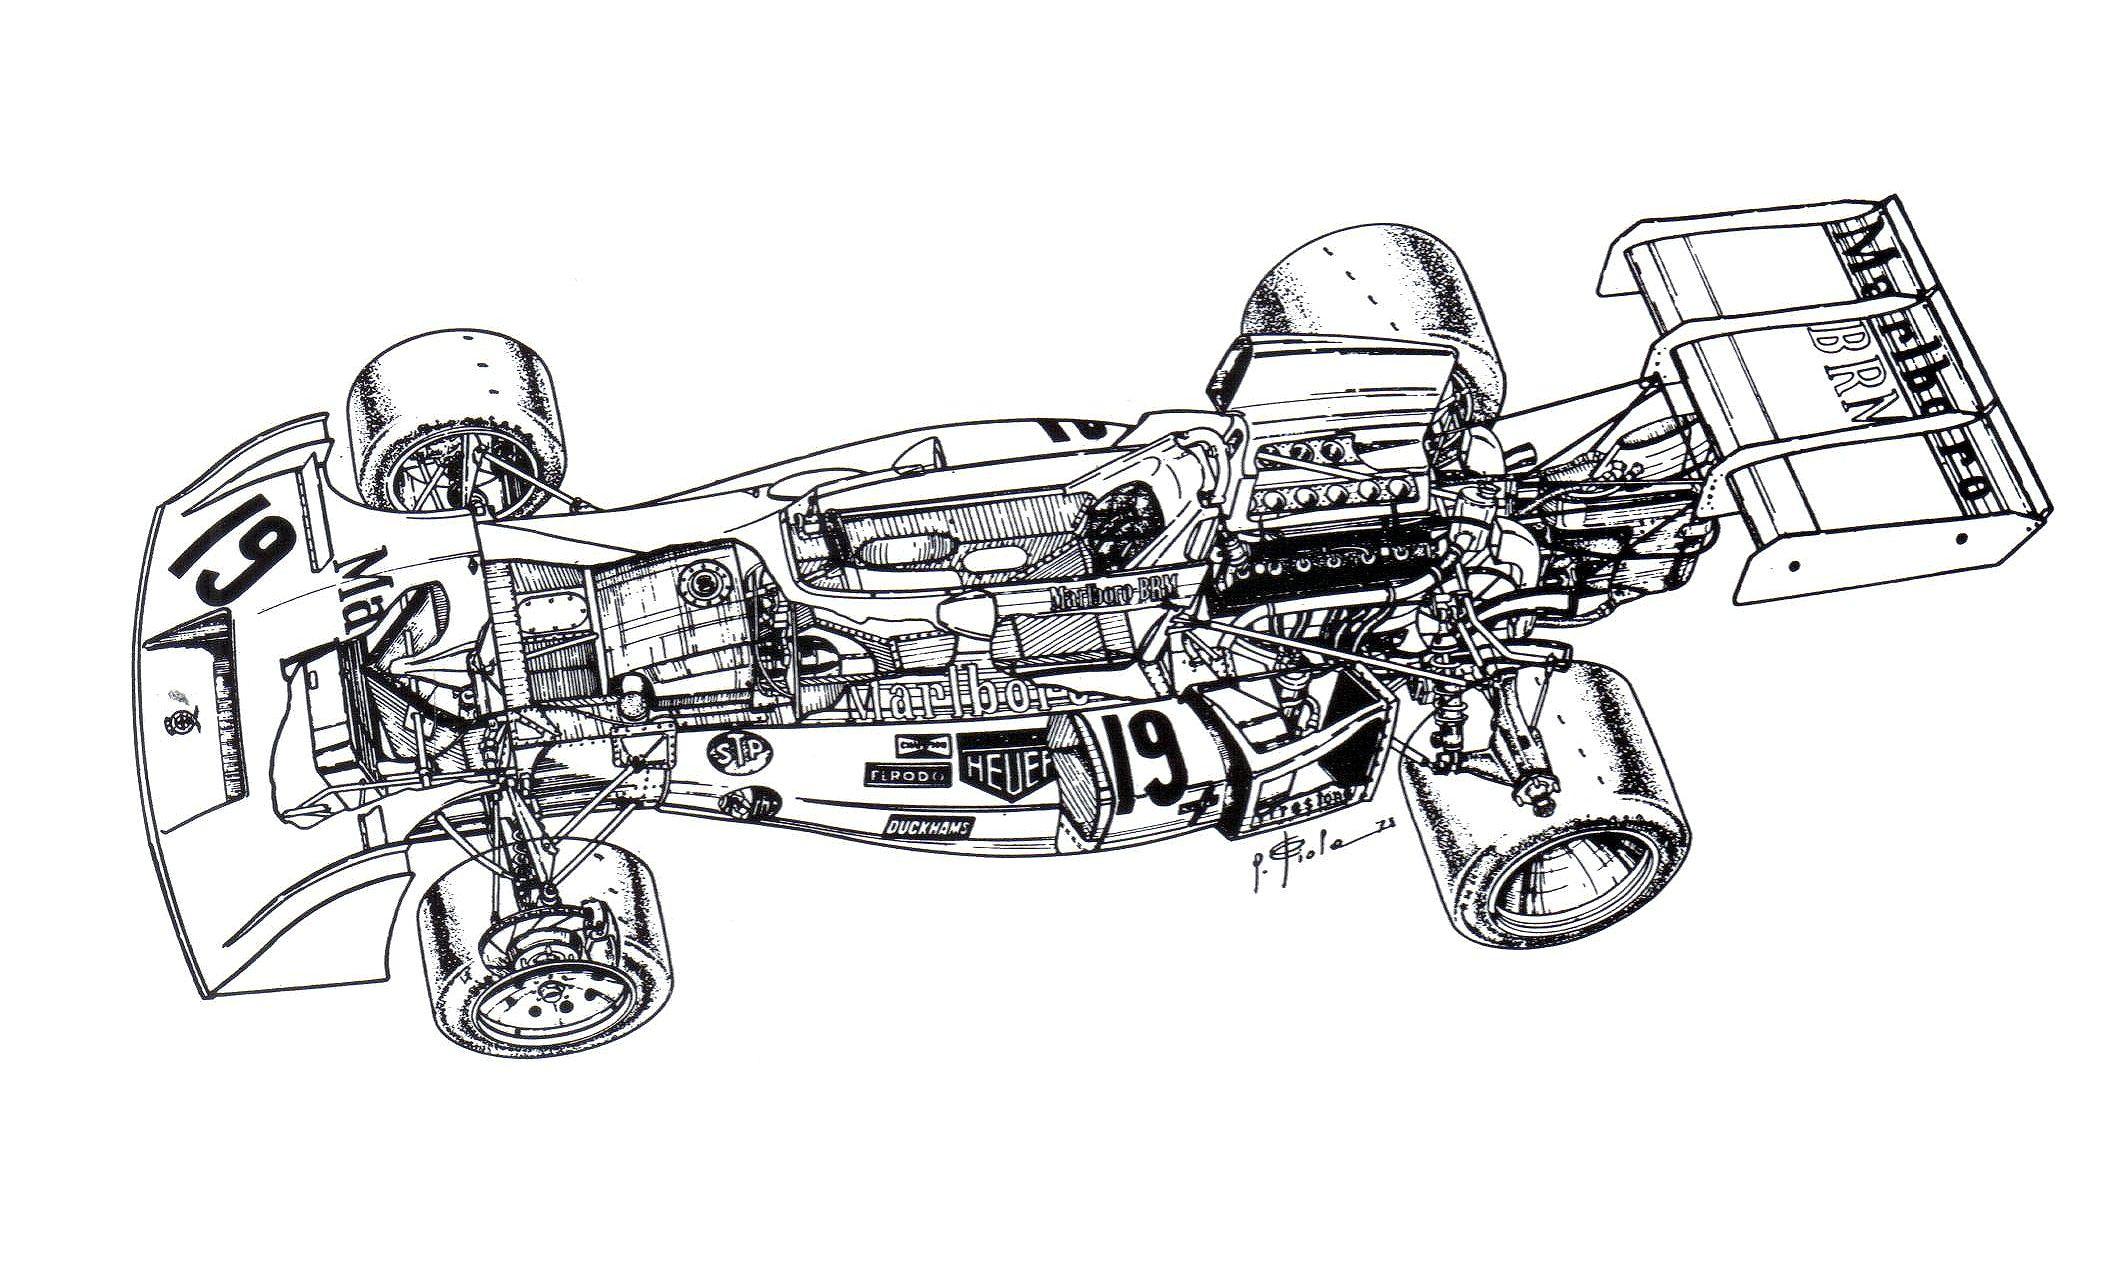 1973-1974 brm p160e - illustration by giorgio piola